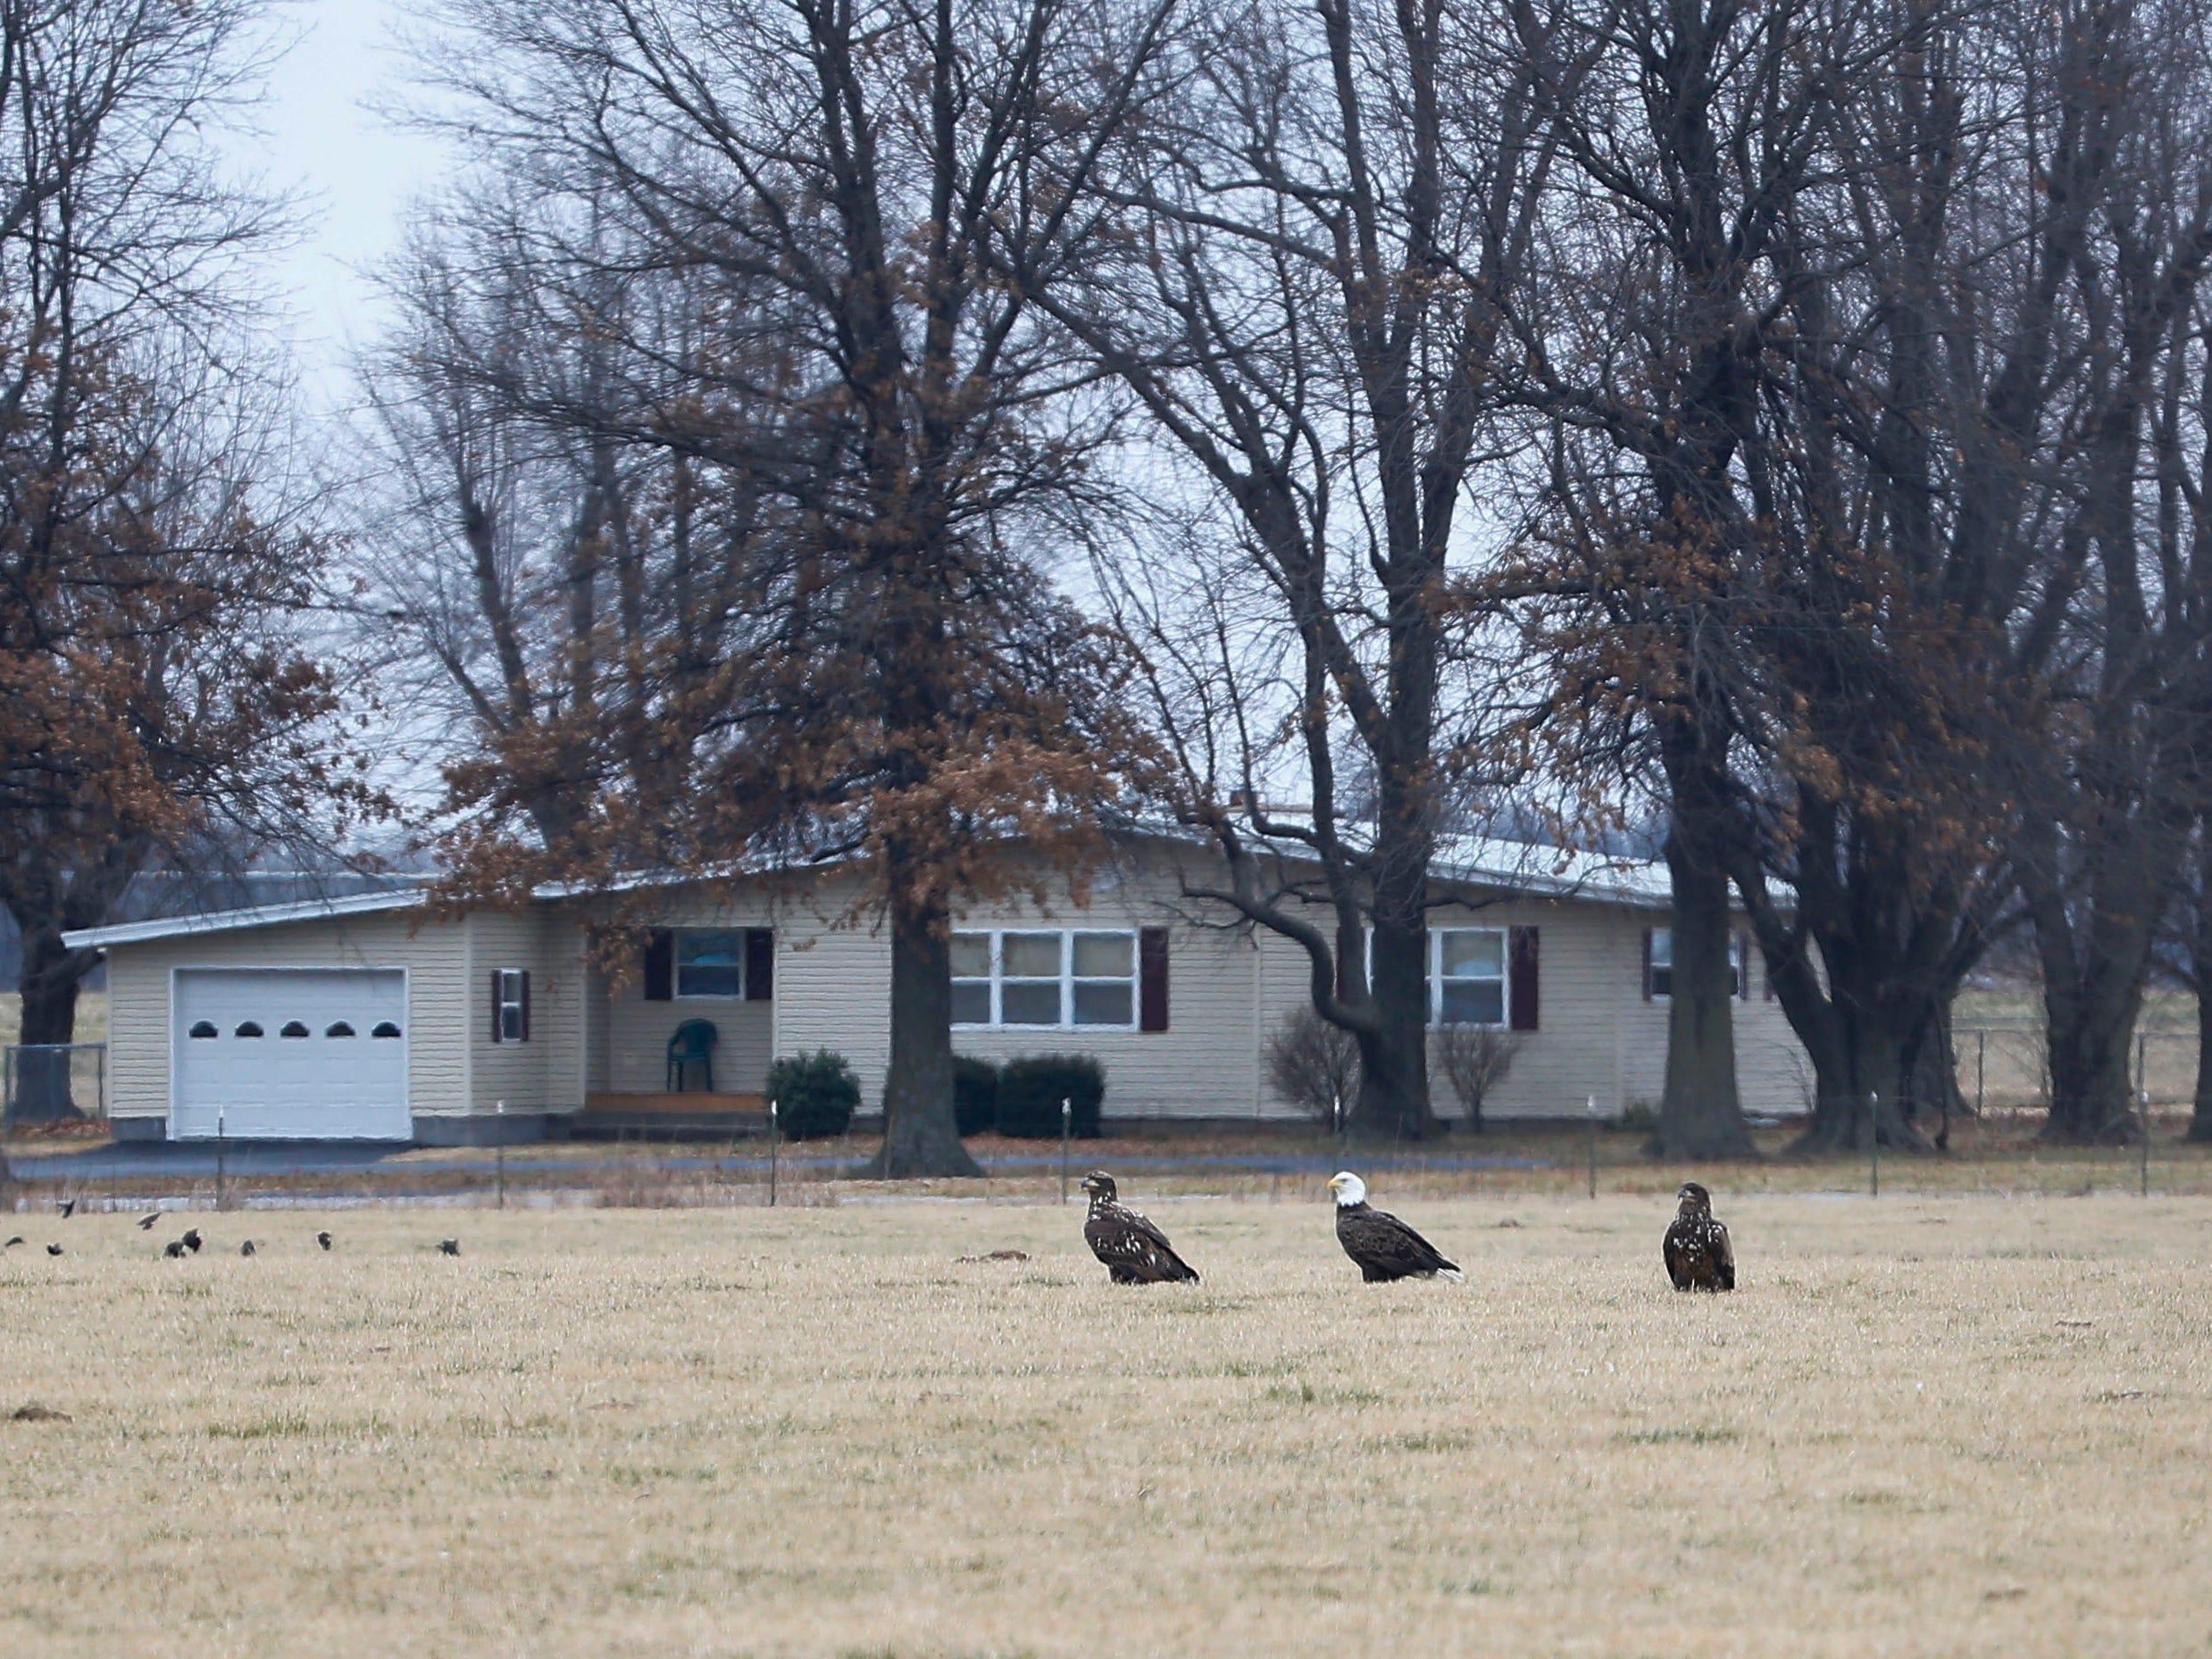 Three bald eagles sit in a field near Stella, Mo. on Saturday, Dec. 29, 2018.